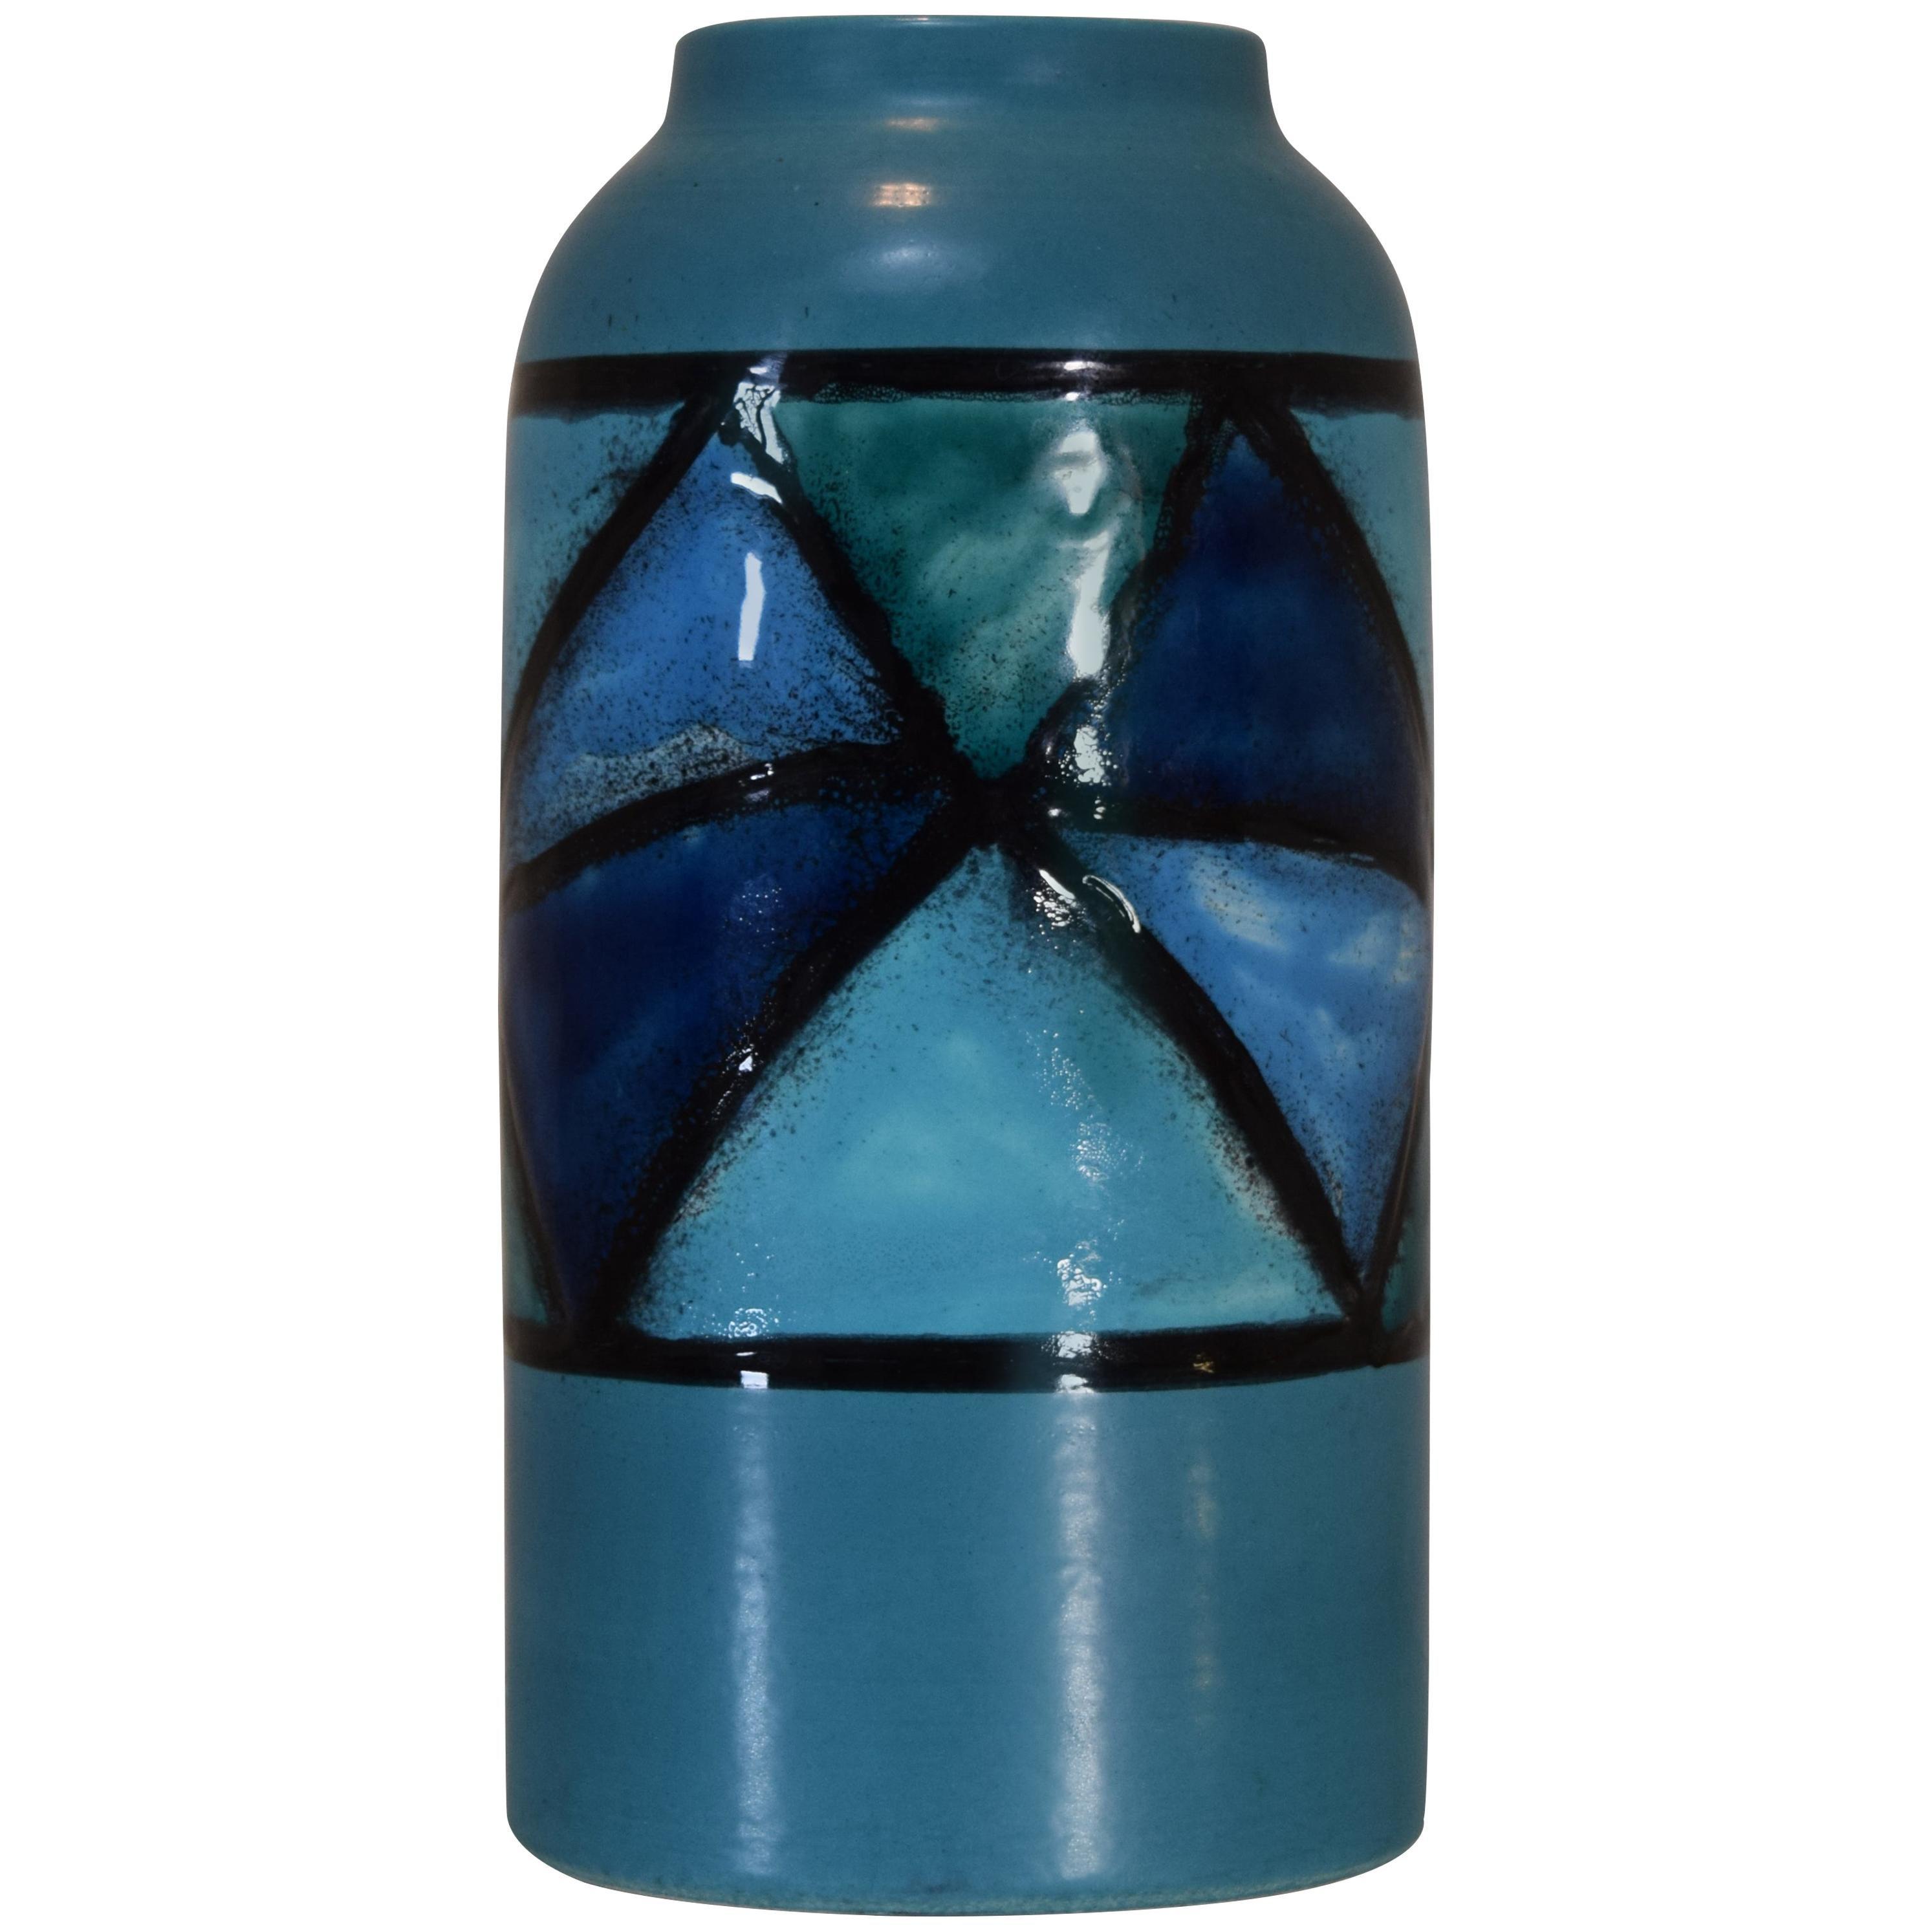 Vetrata Series Vase by Aldo Londi Bitossi